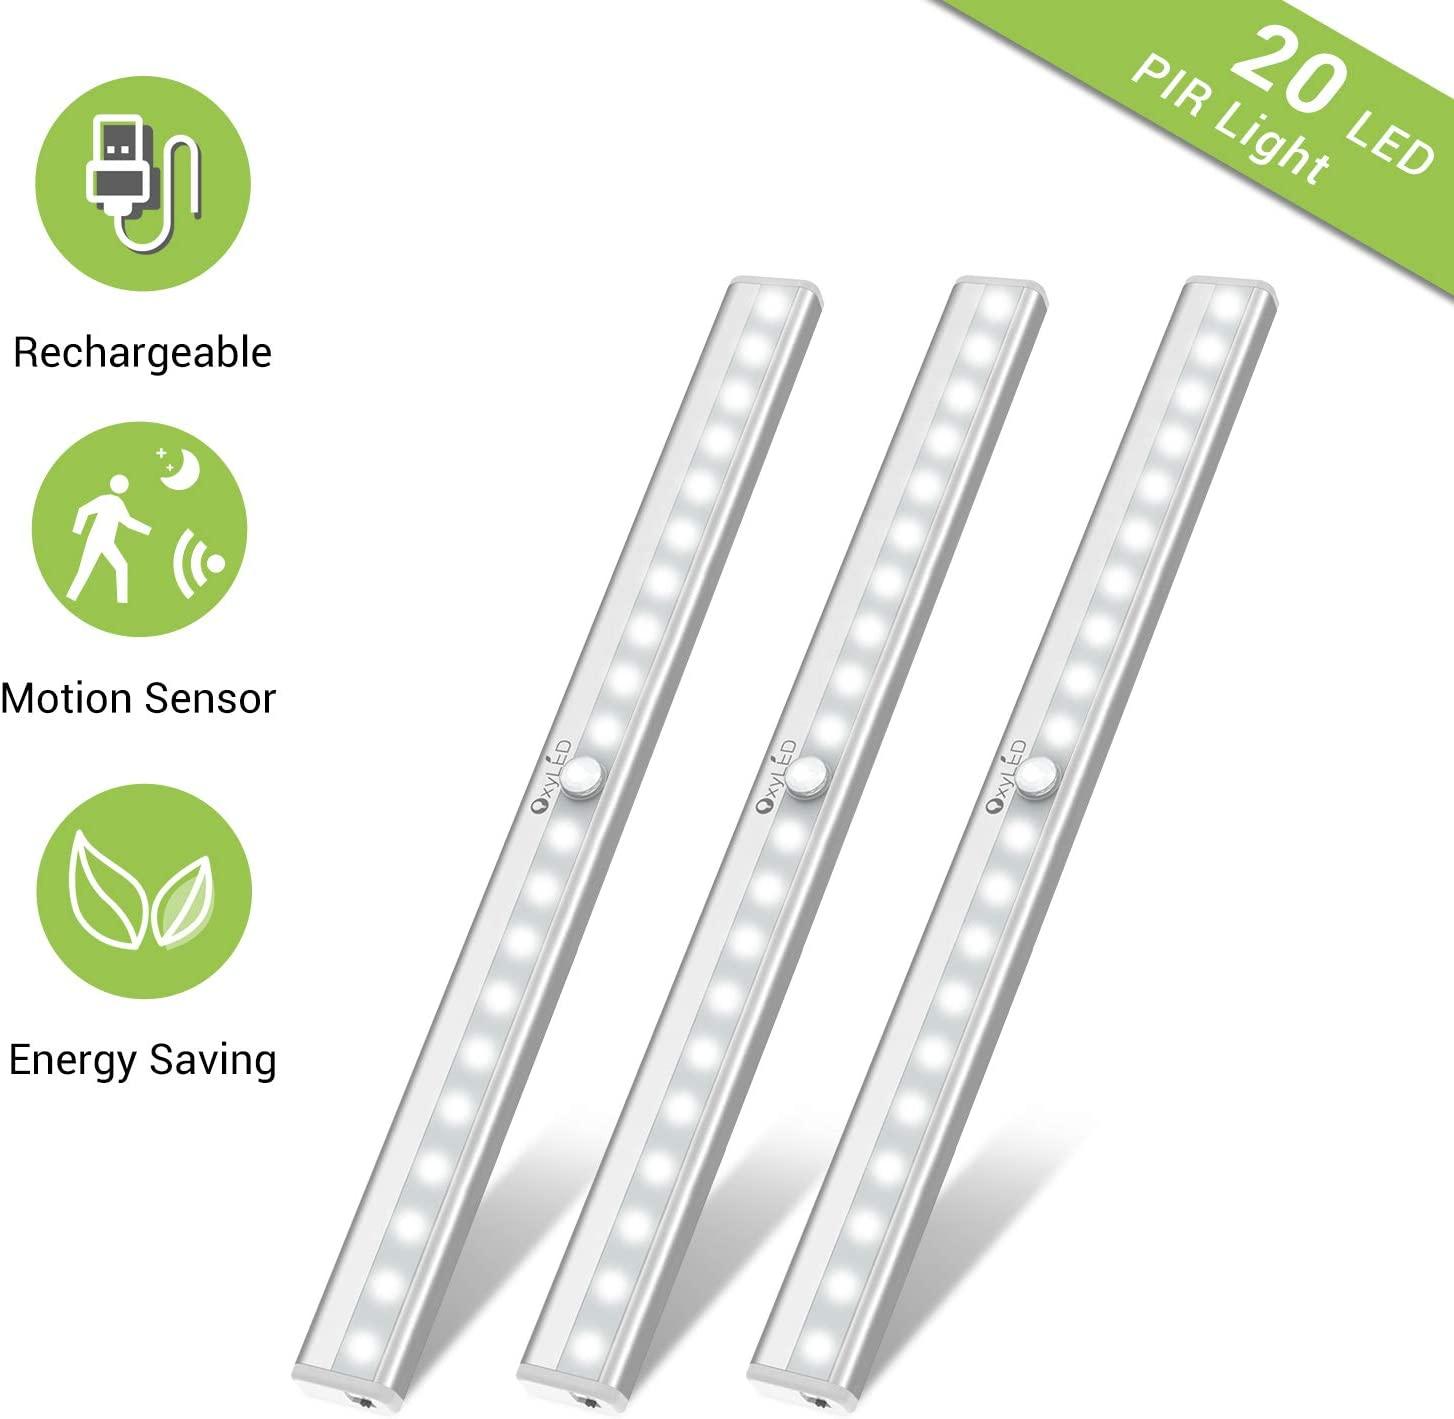 Under Cabinet Lighting, Motion Sensor Closet Lights OxyLED 20 LED USB Rechargeable Under Cabinet Lights Wireless Under Counter Lighting, Motion Led Light Bar for Closet, Cabinet (T-02S, 3 Pack)